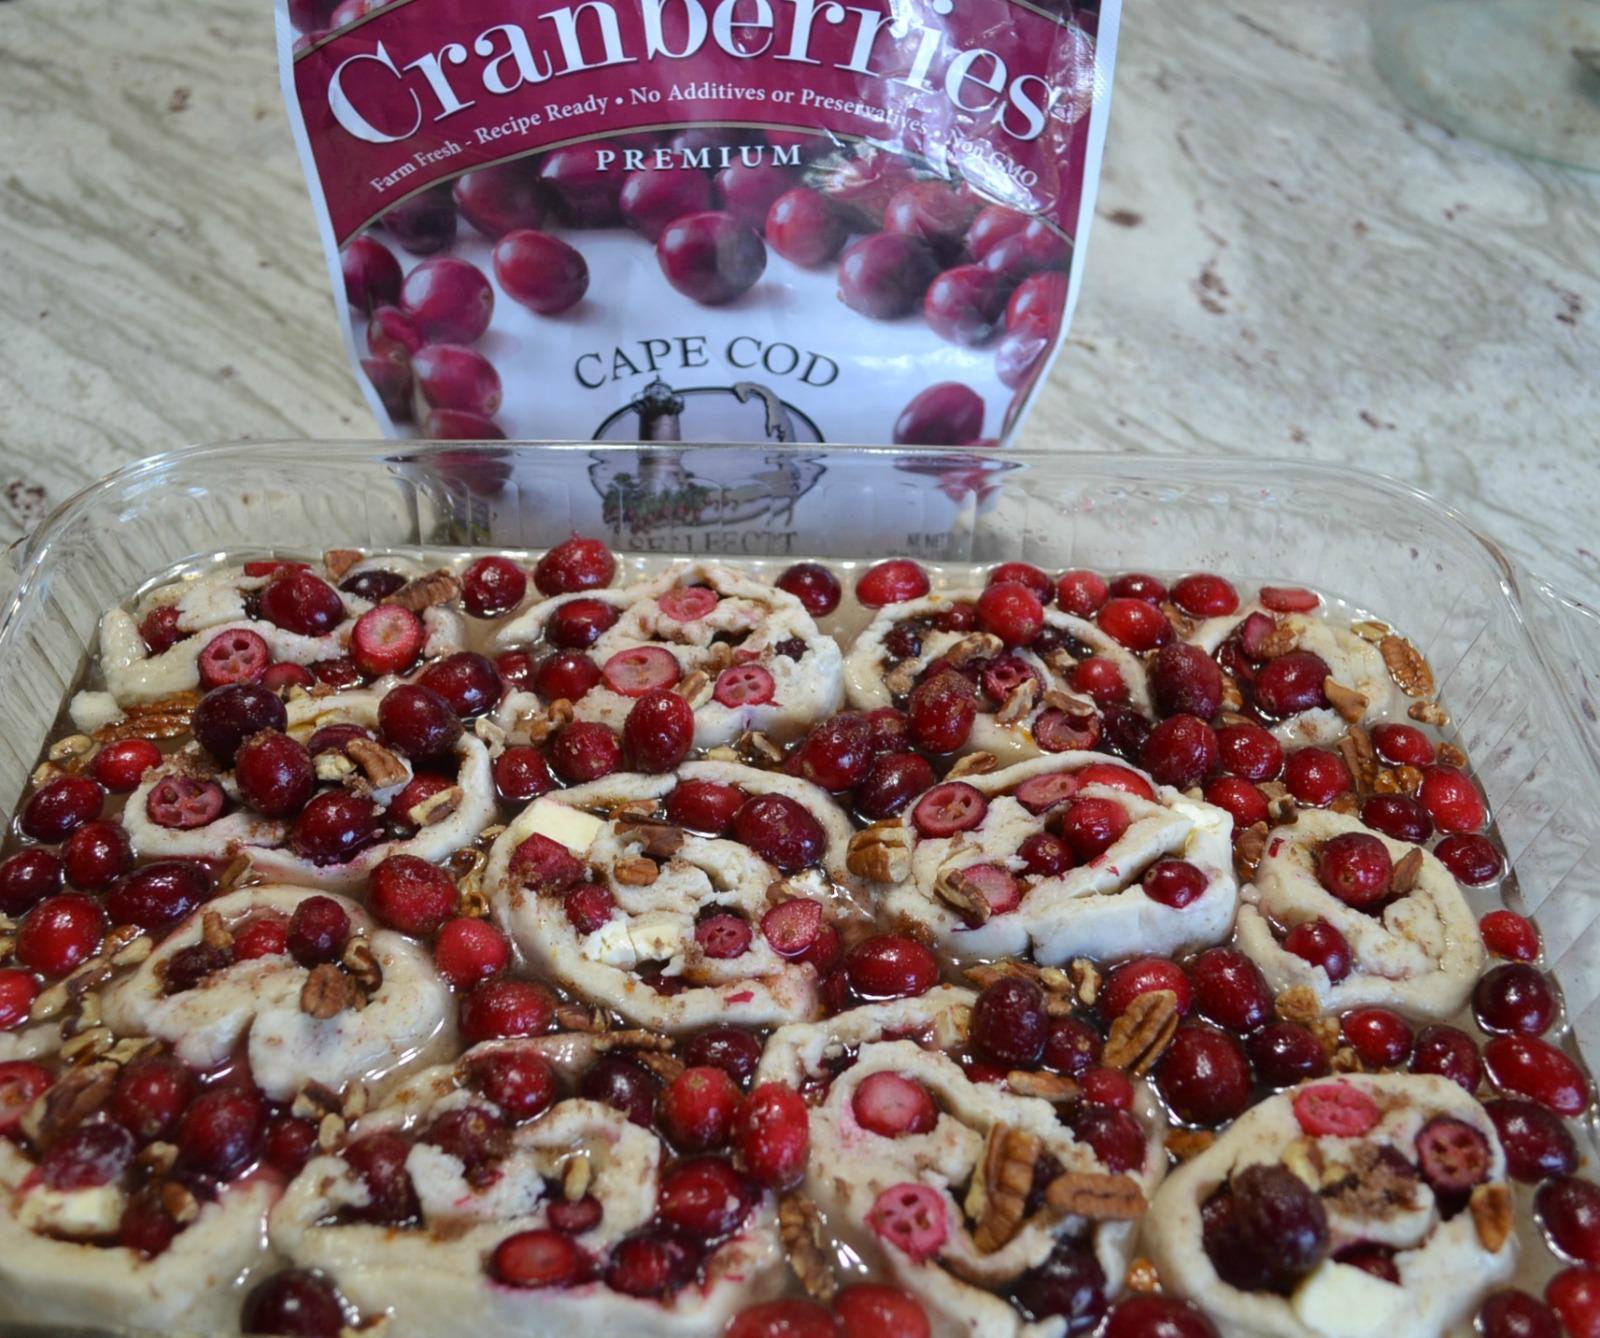 cape cod select, frozen cranberries, dessert, holiday baking, cobbler roll